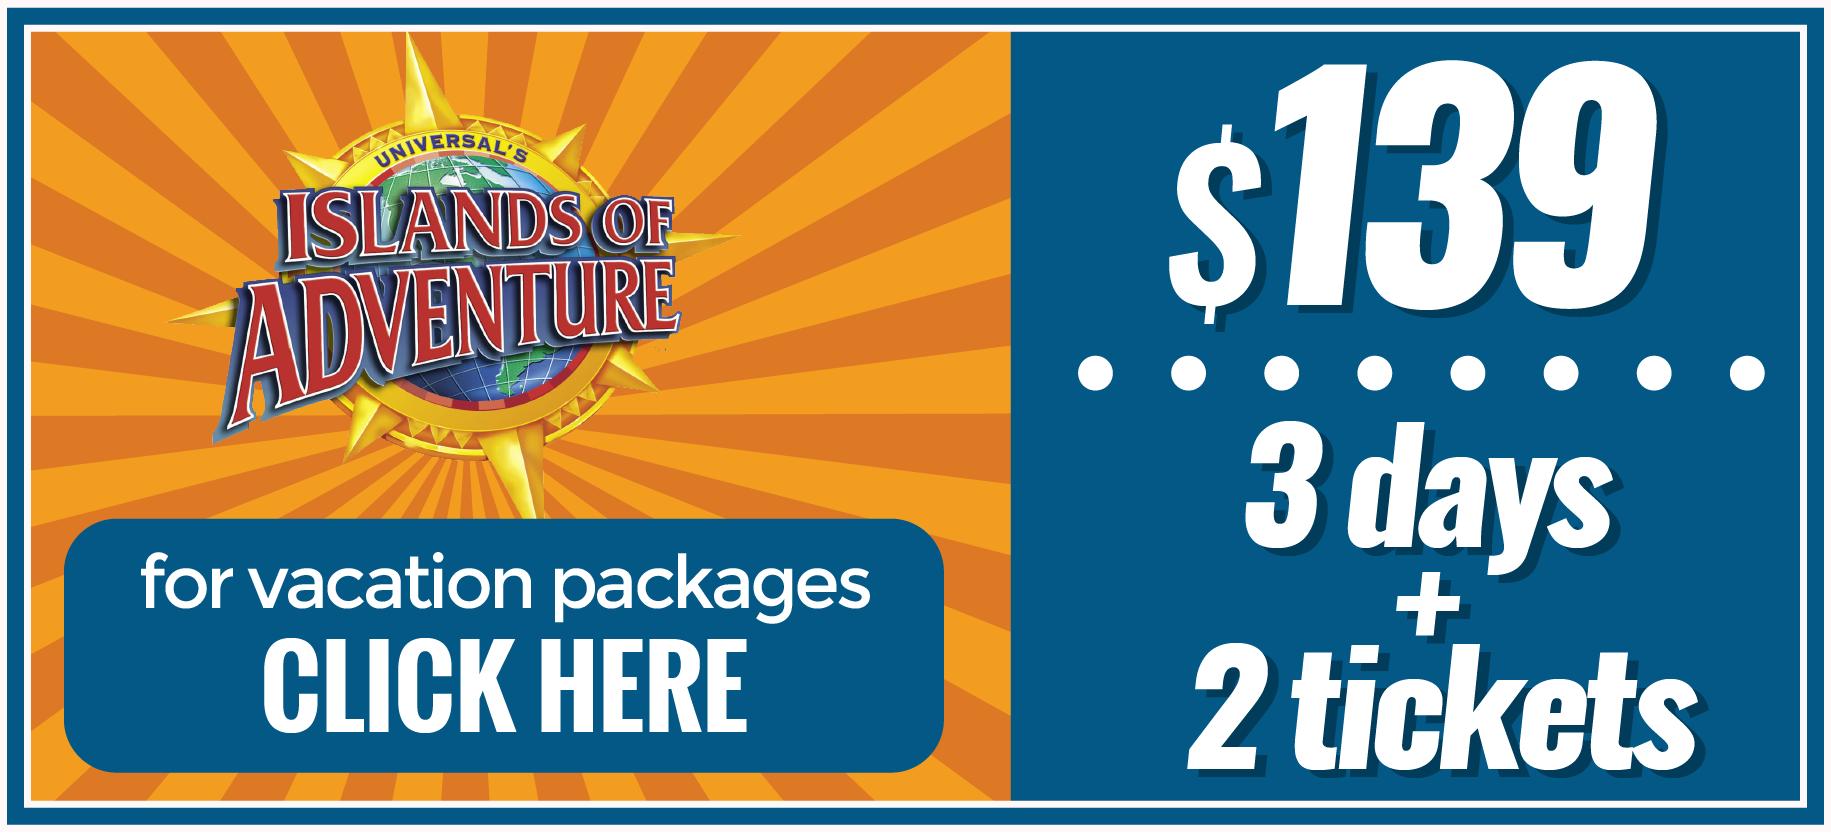 Orlando Discount Vacation Packages Orlando Tickets